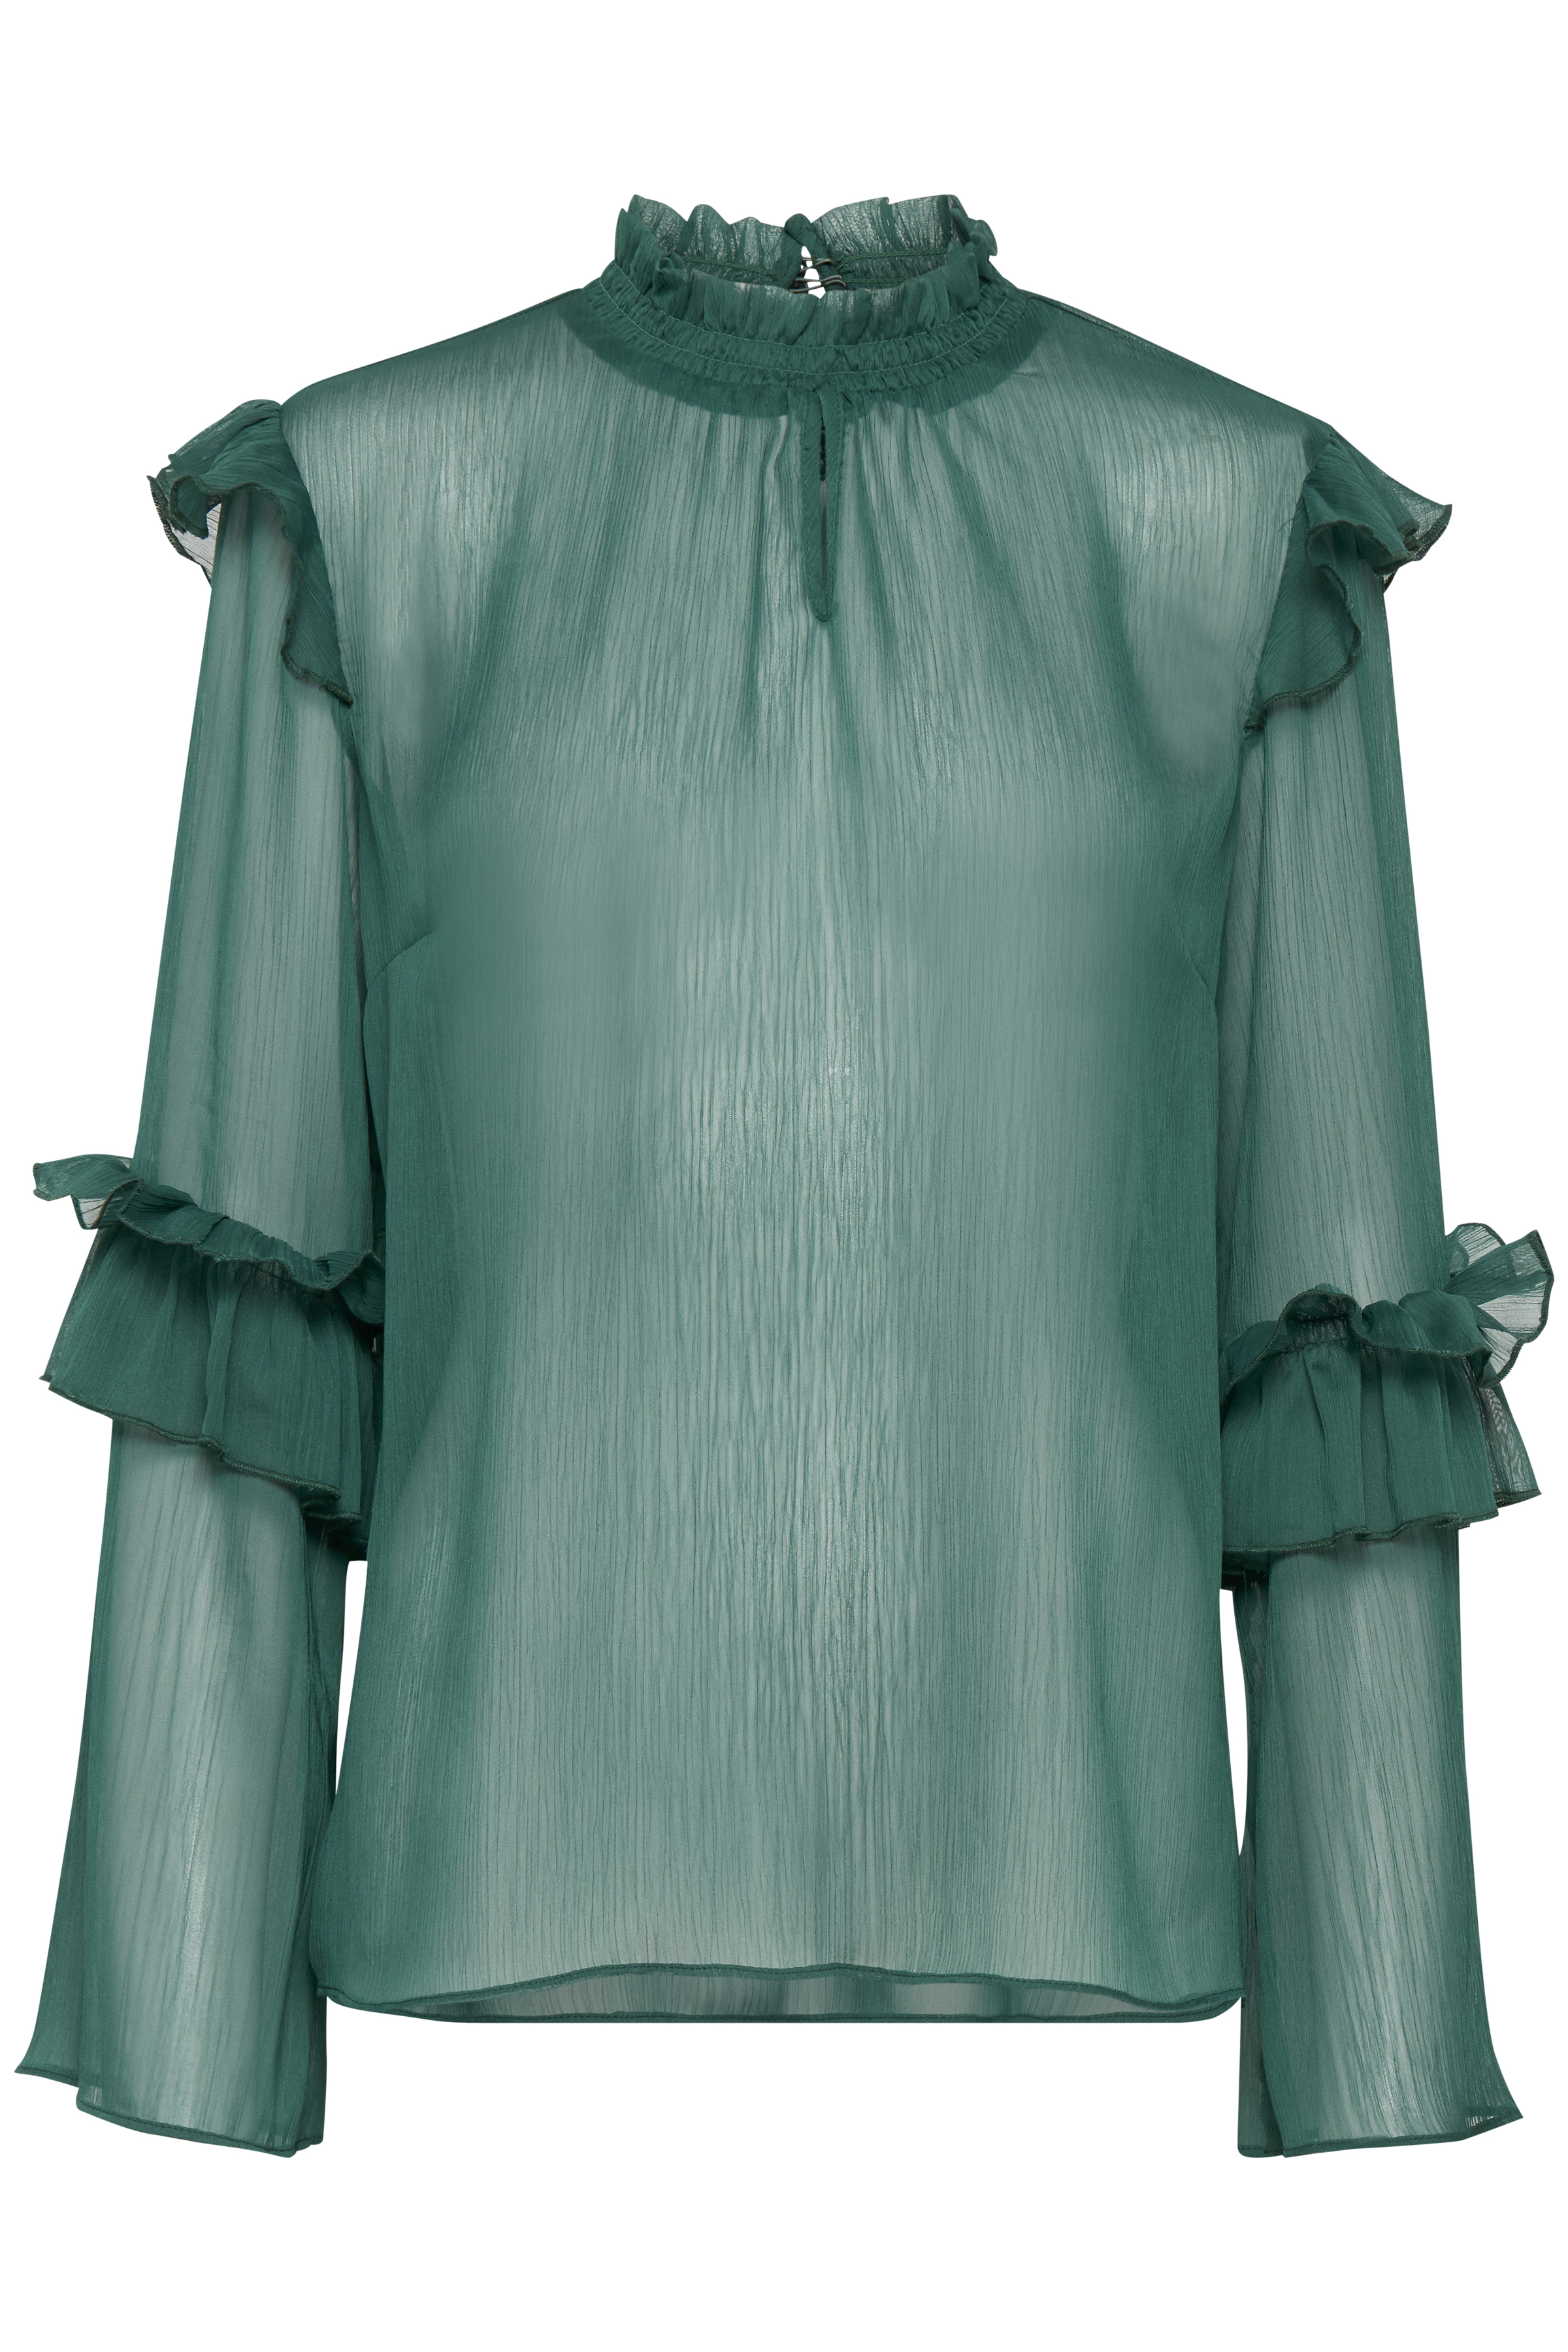 Amazon Green Langærmet bluse – Køb Amazon Green Langærmet bluse fra str. XS-XXL her